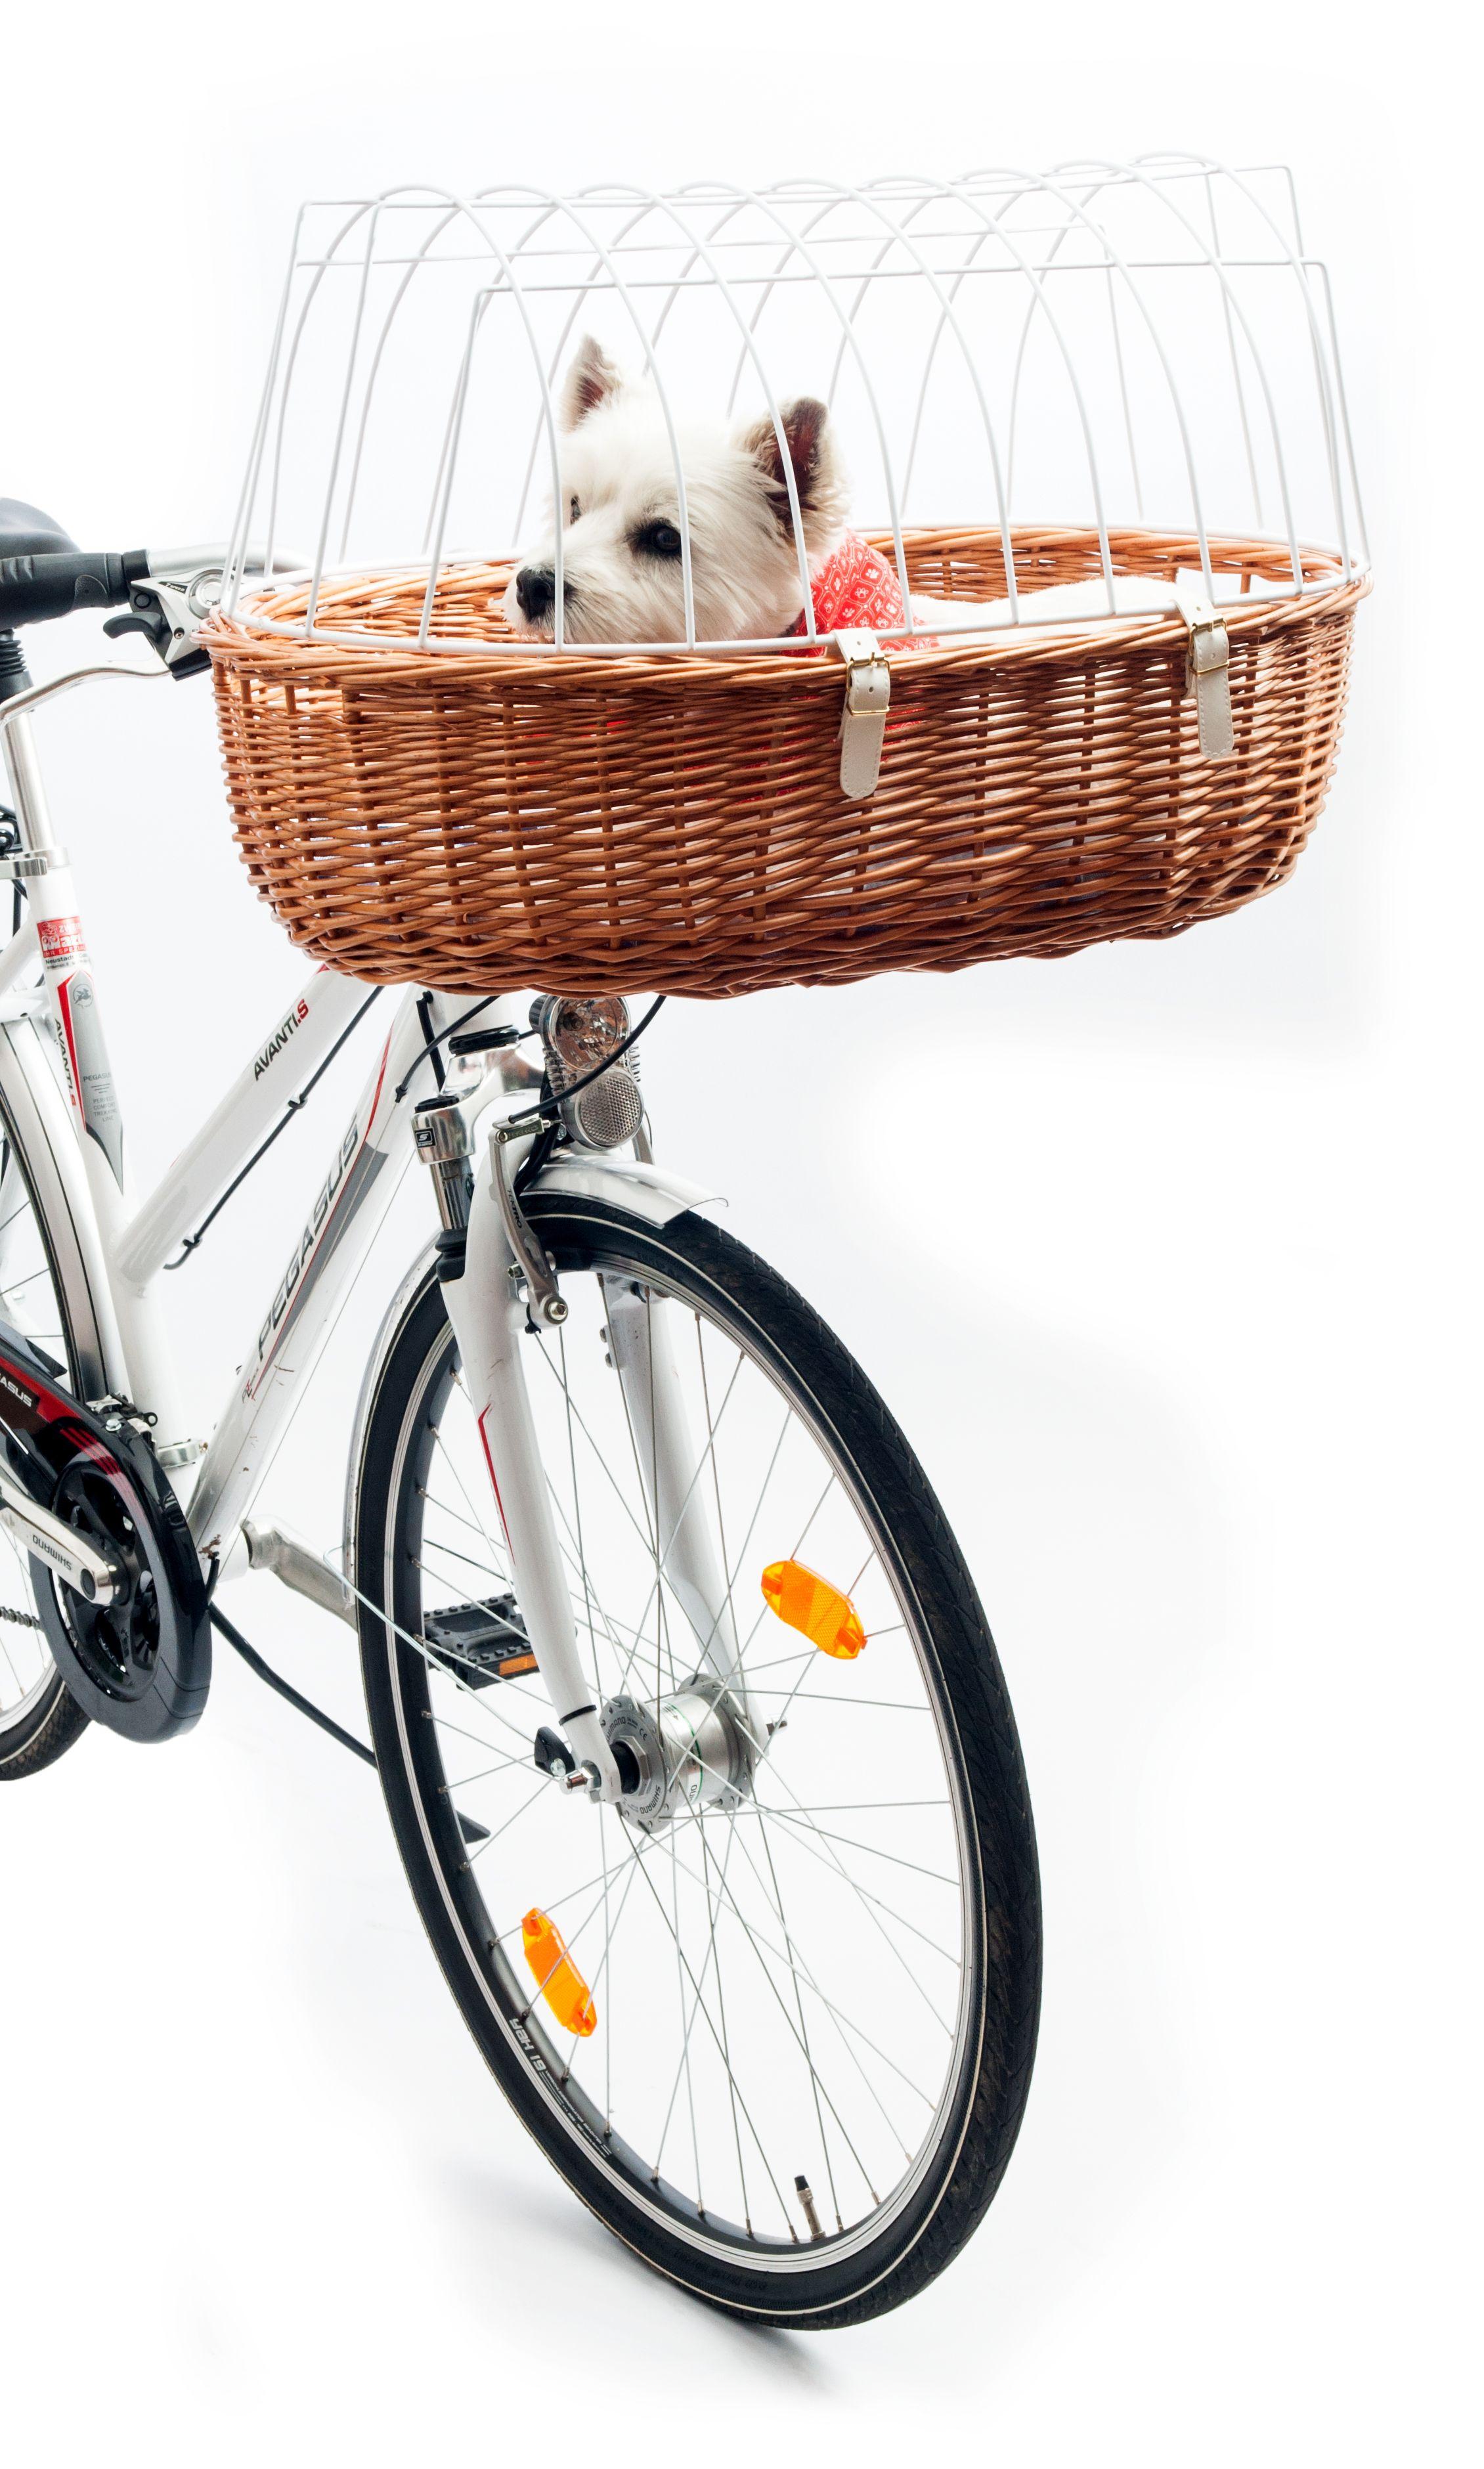 Aumüller E-Bike fähiger Fahrradkorb Maxi mit Steuerkopfmontagesystem 167 70x46x18/40cm